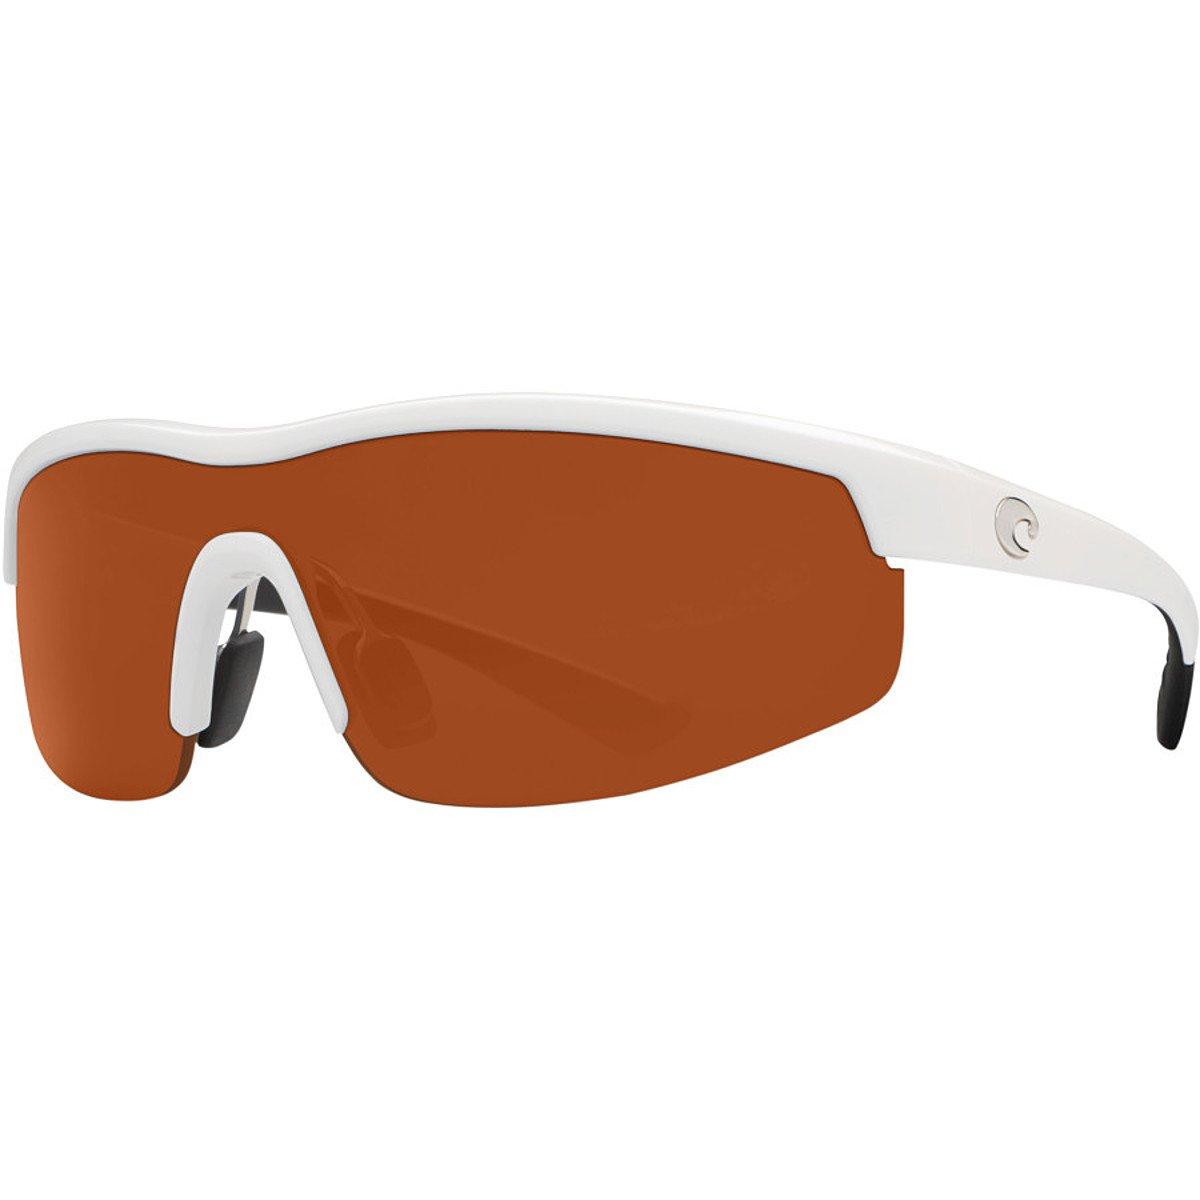 Costa Straits Polarized Sunglasses - Costa 580 Polycarbonate Lens Matte Black/Blue Mirror, One Size - Men's